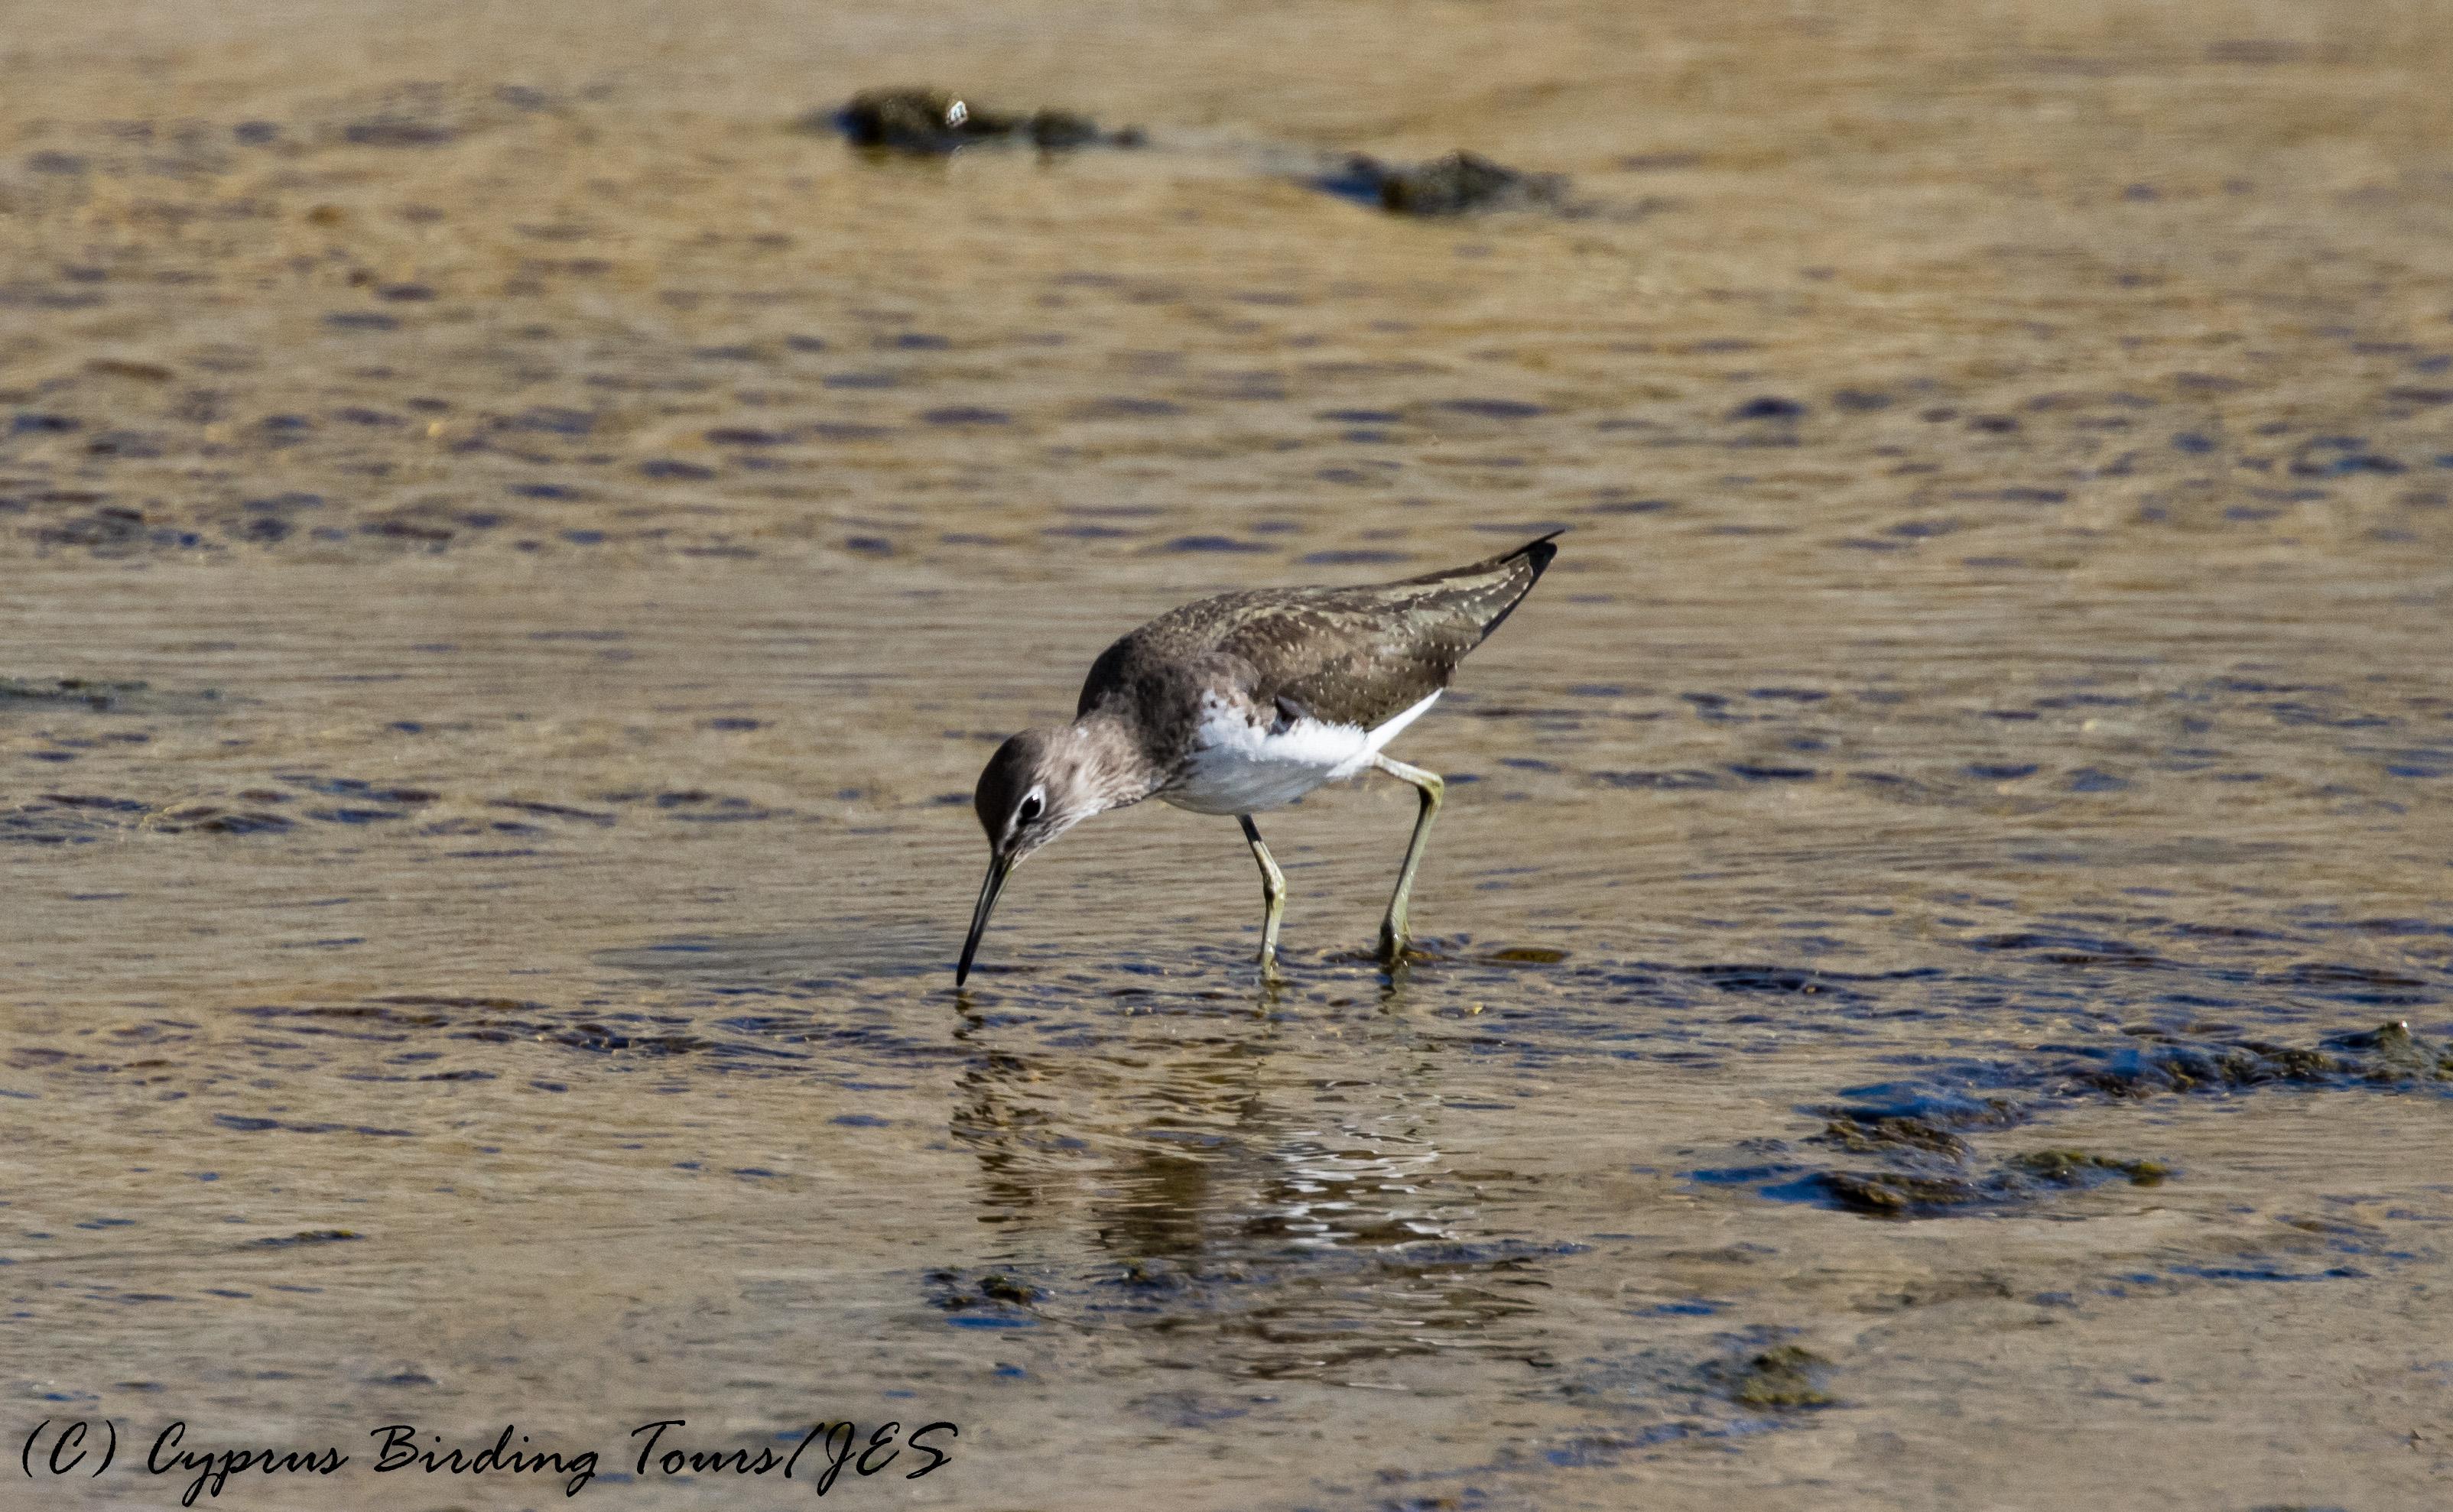 Green Sandpiper, Larnaca Salt Lake, 26th October 2016 (c) Cyprus Birding Tours